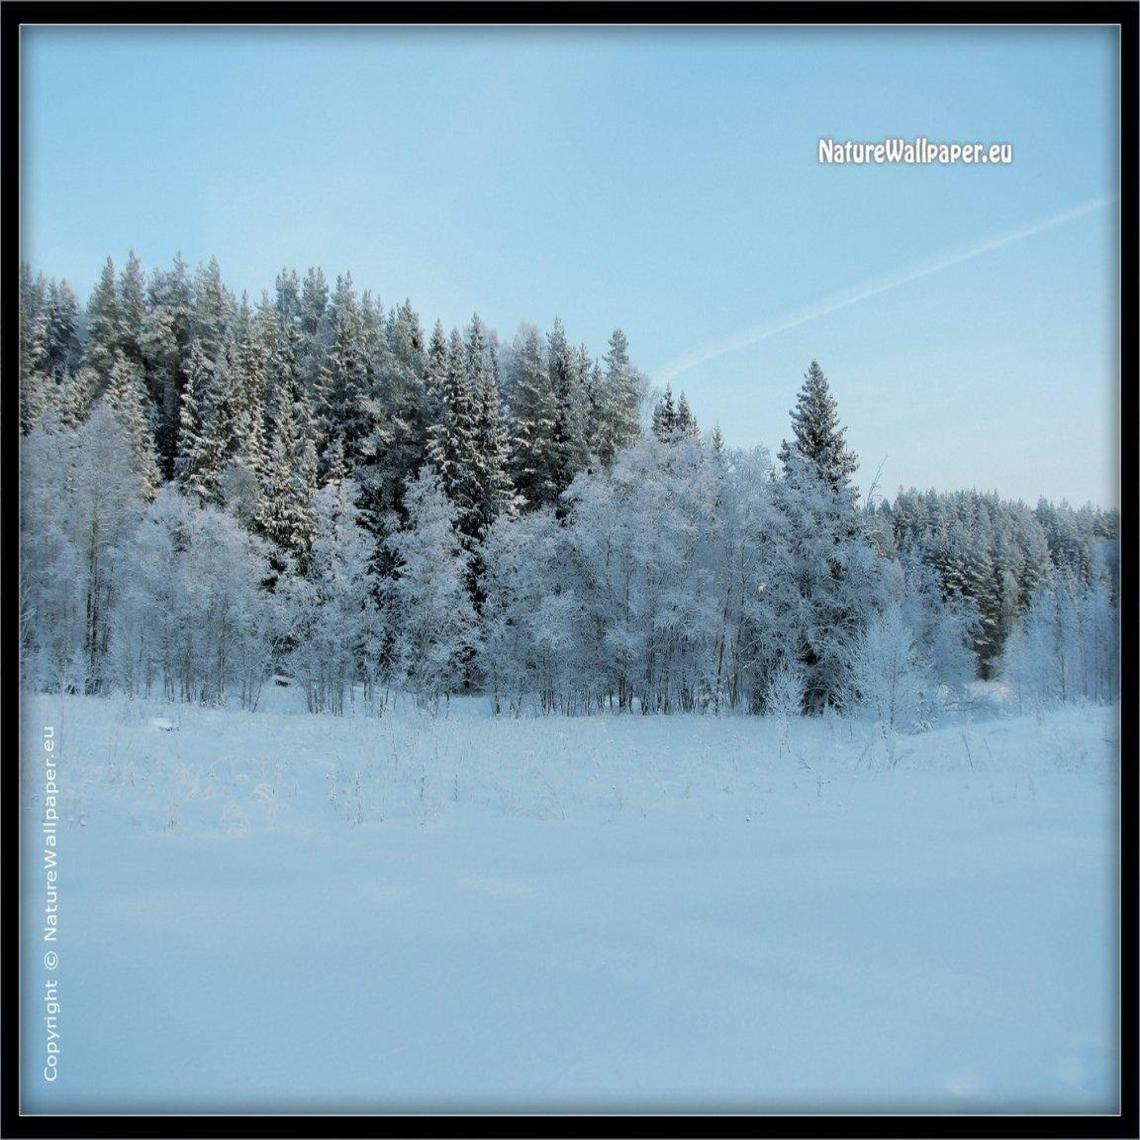 winter tress